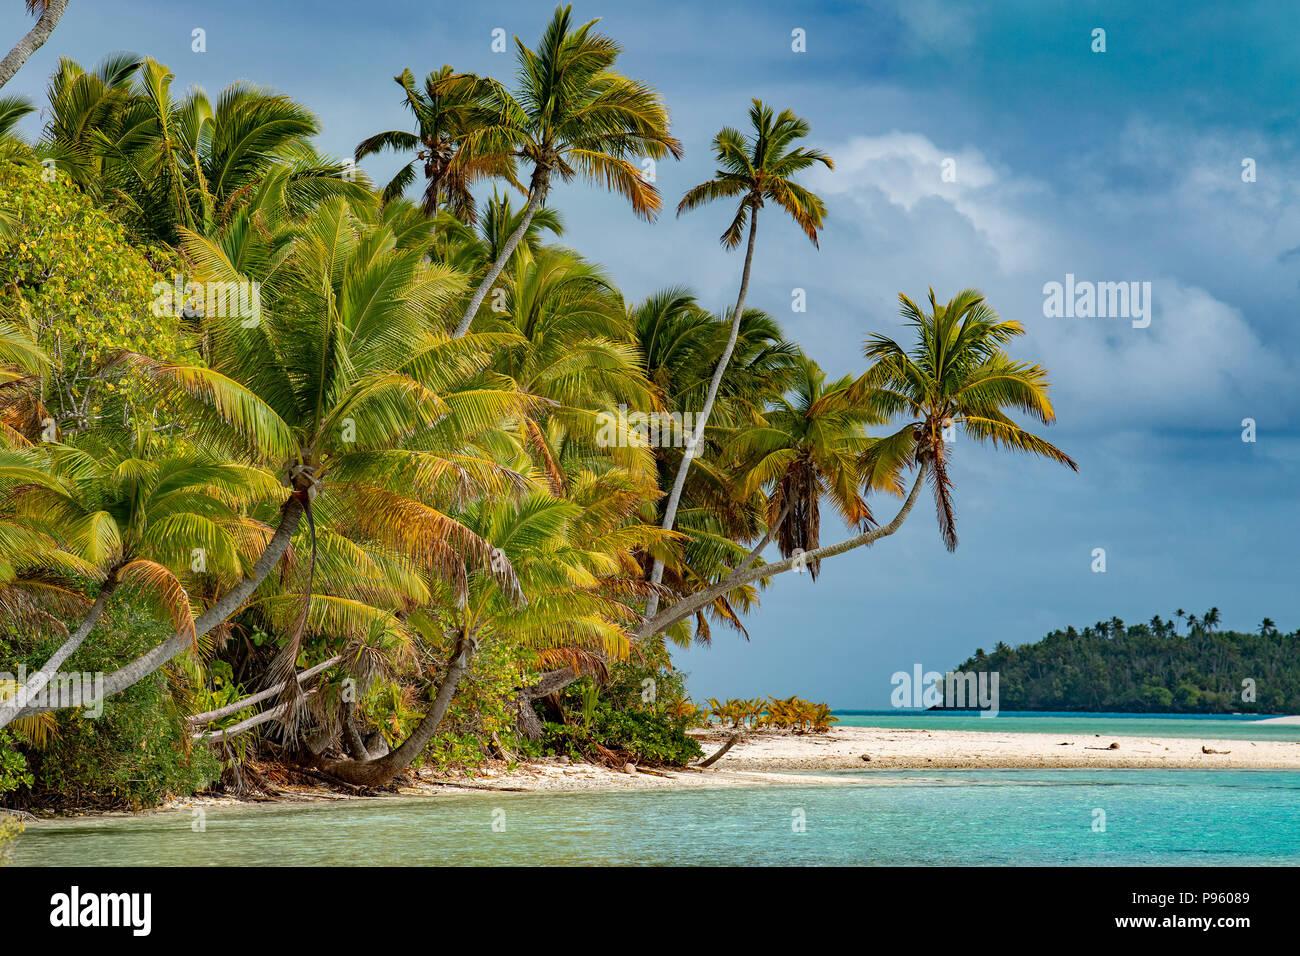 Insel Kokospalme auf Polynesien Strand wunderbare Lagune Stockbild